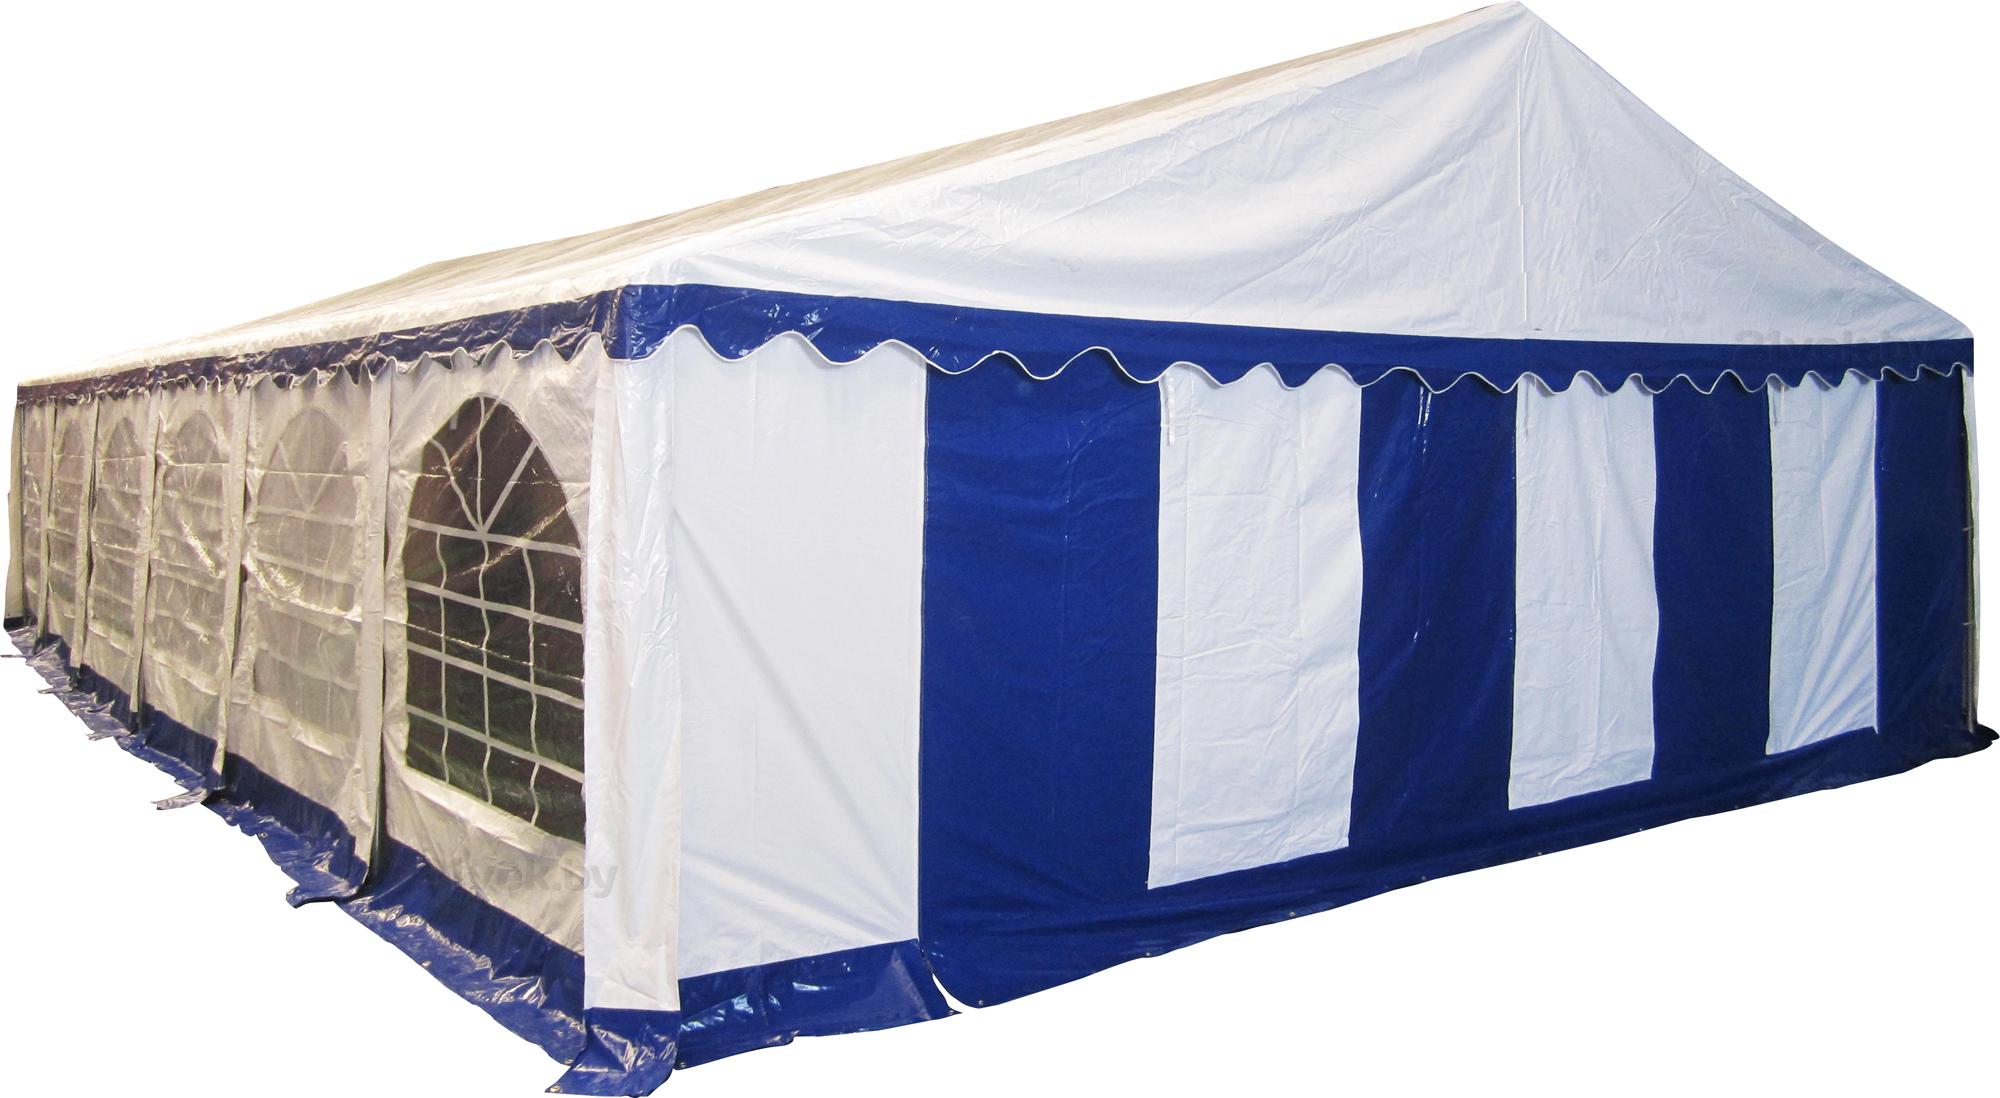 Купить Тент-шатер Sundays, 812201, Китай